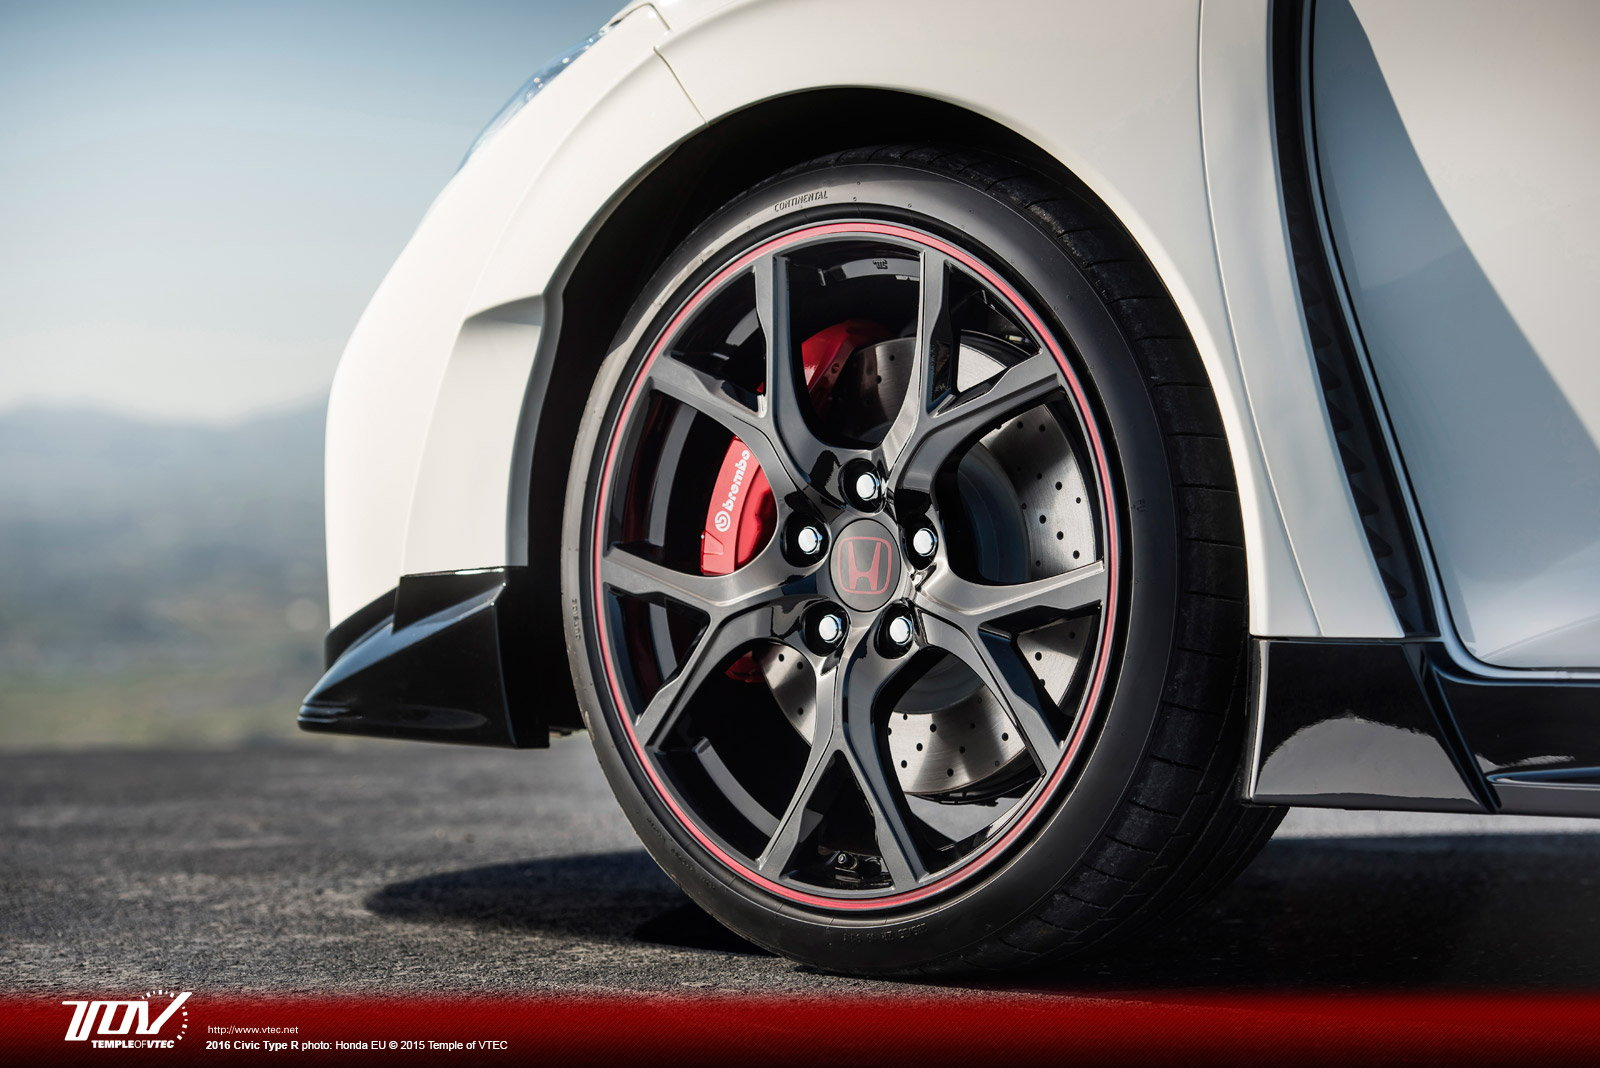 Honda: Civic News - Page 92 - AcuraZine - Acura Enthusiast Community